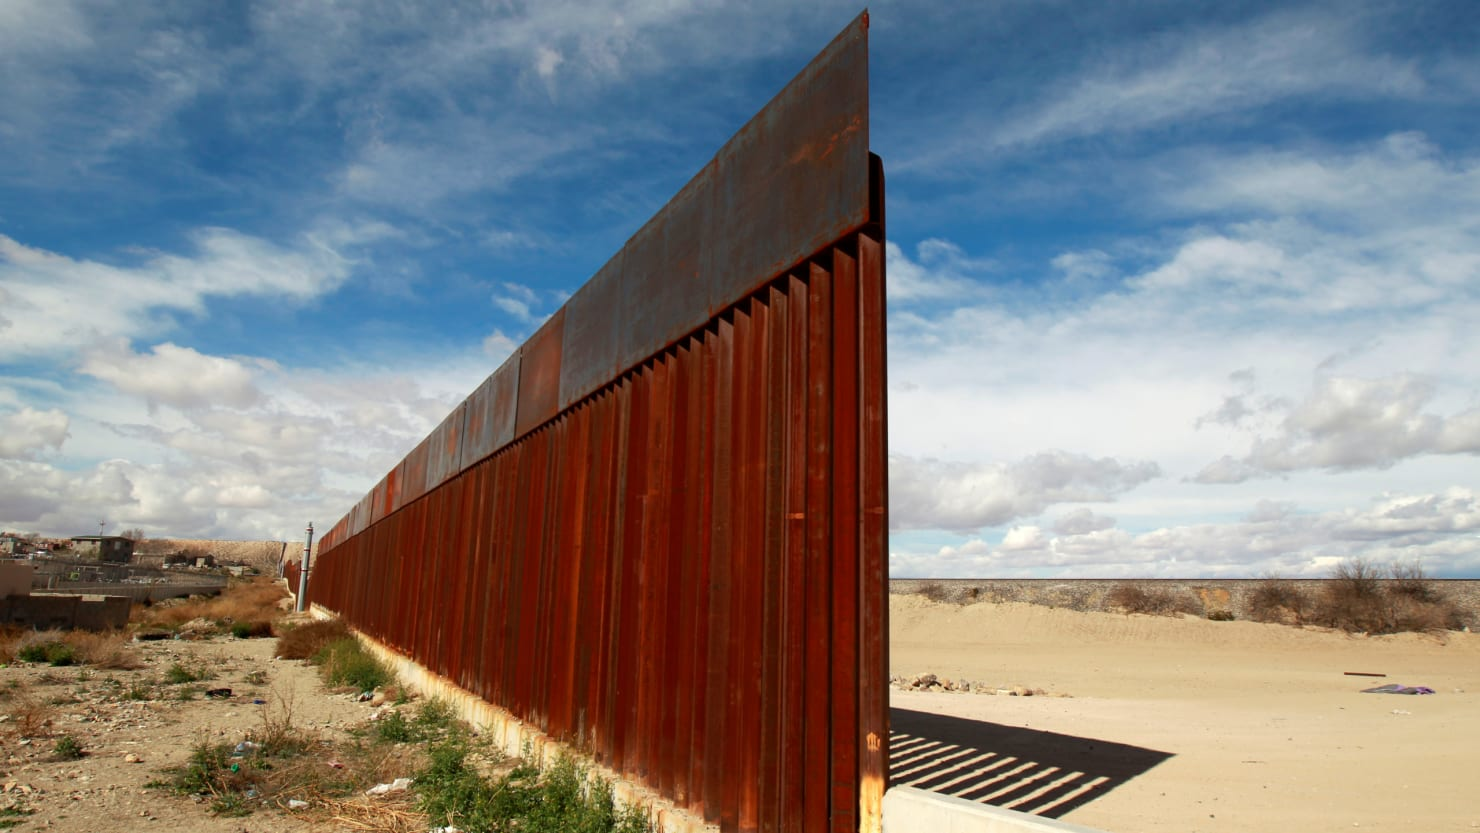 ACLU Denounces Right-Wing Militia Detaining Migrant Families at Border